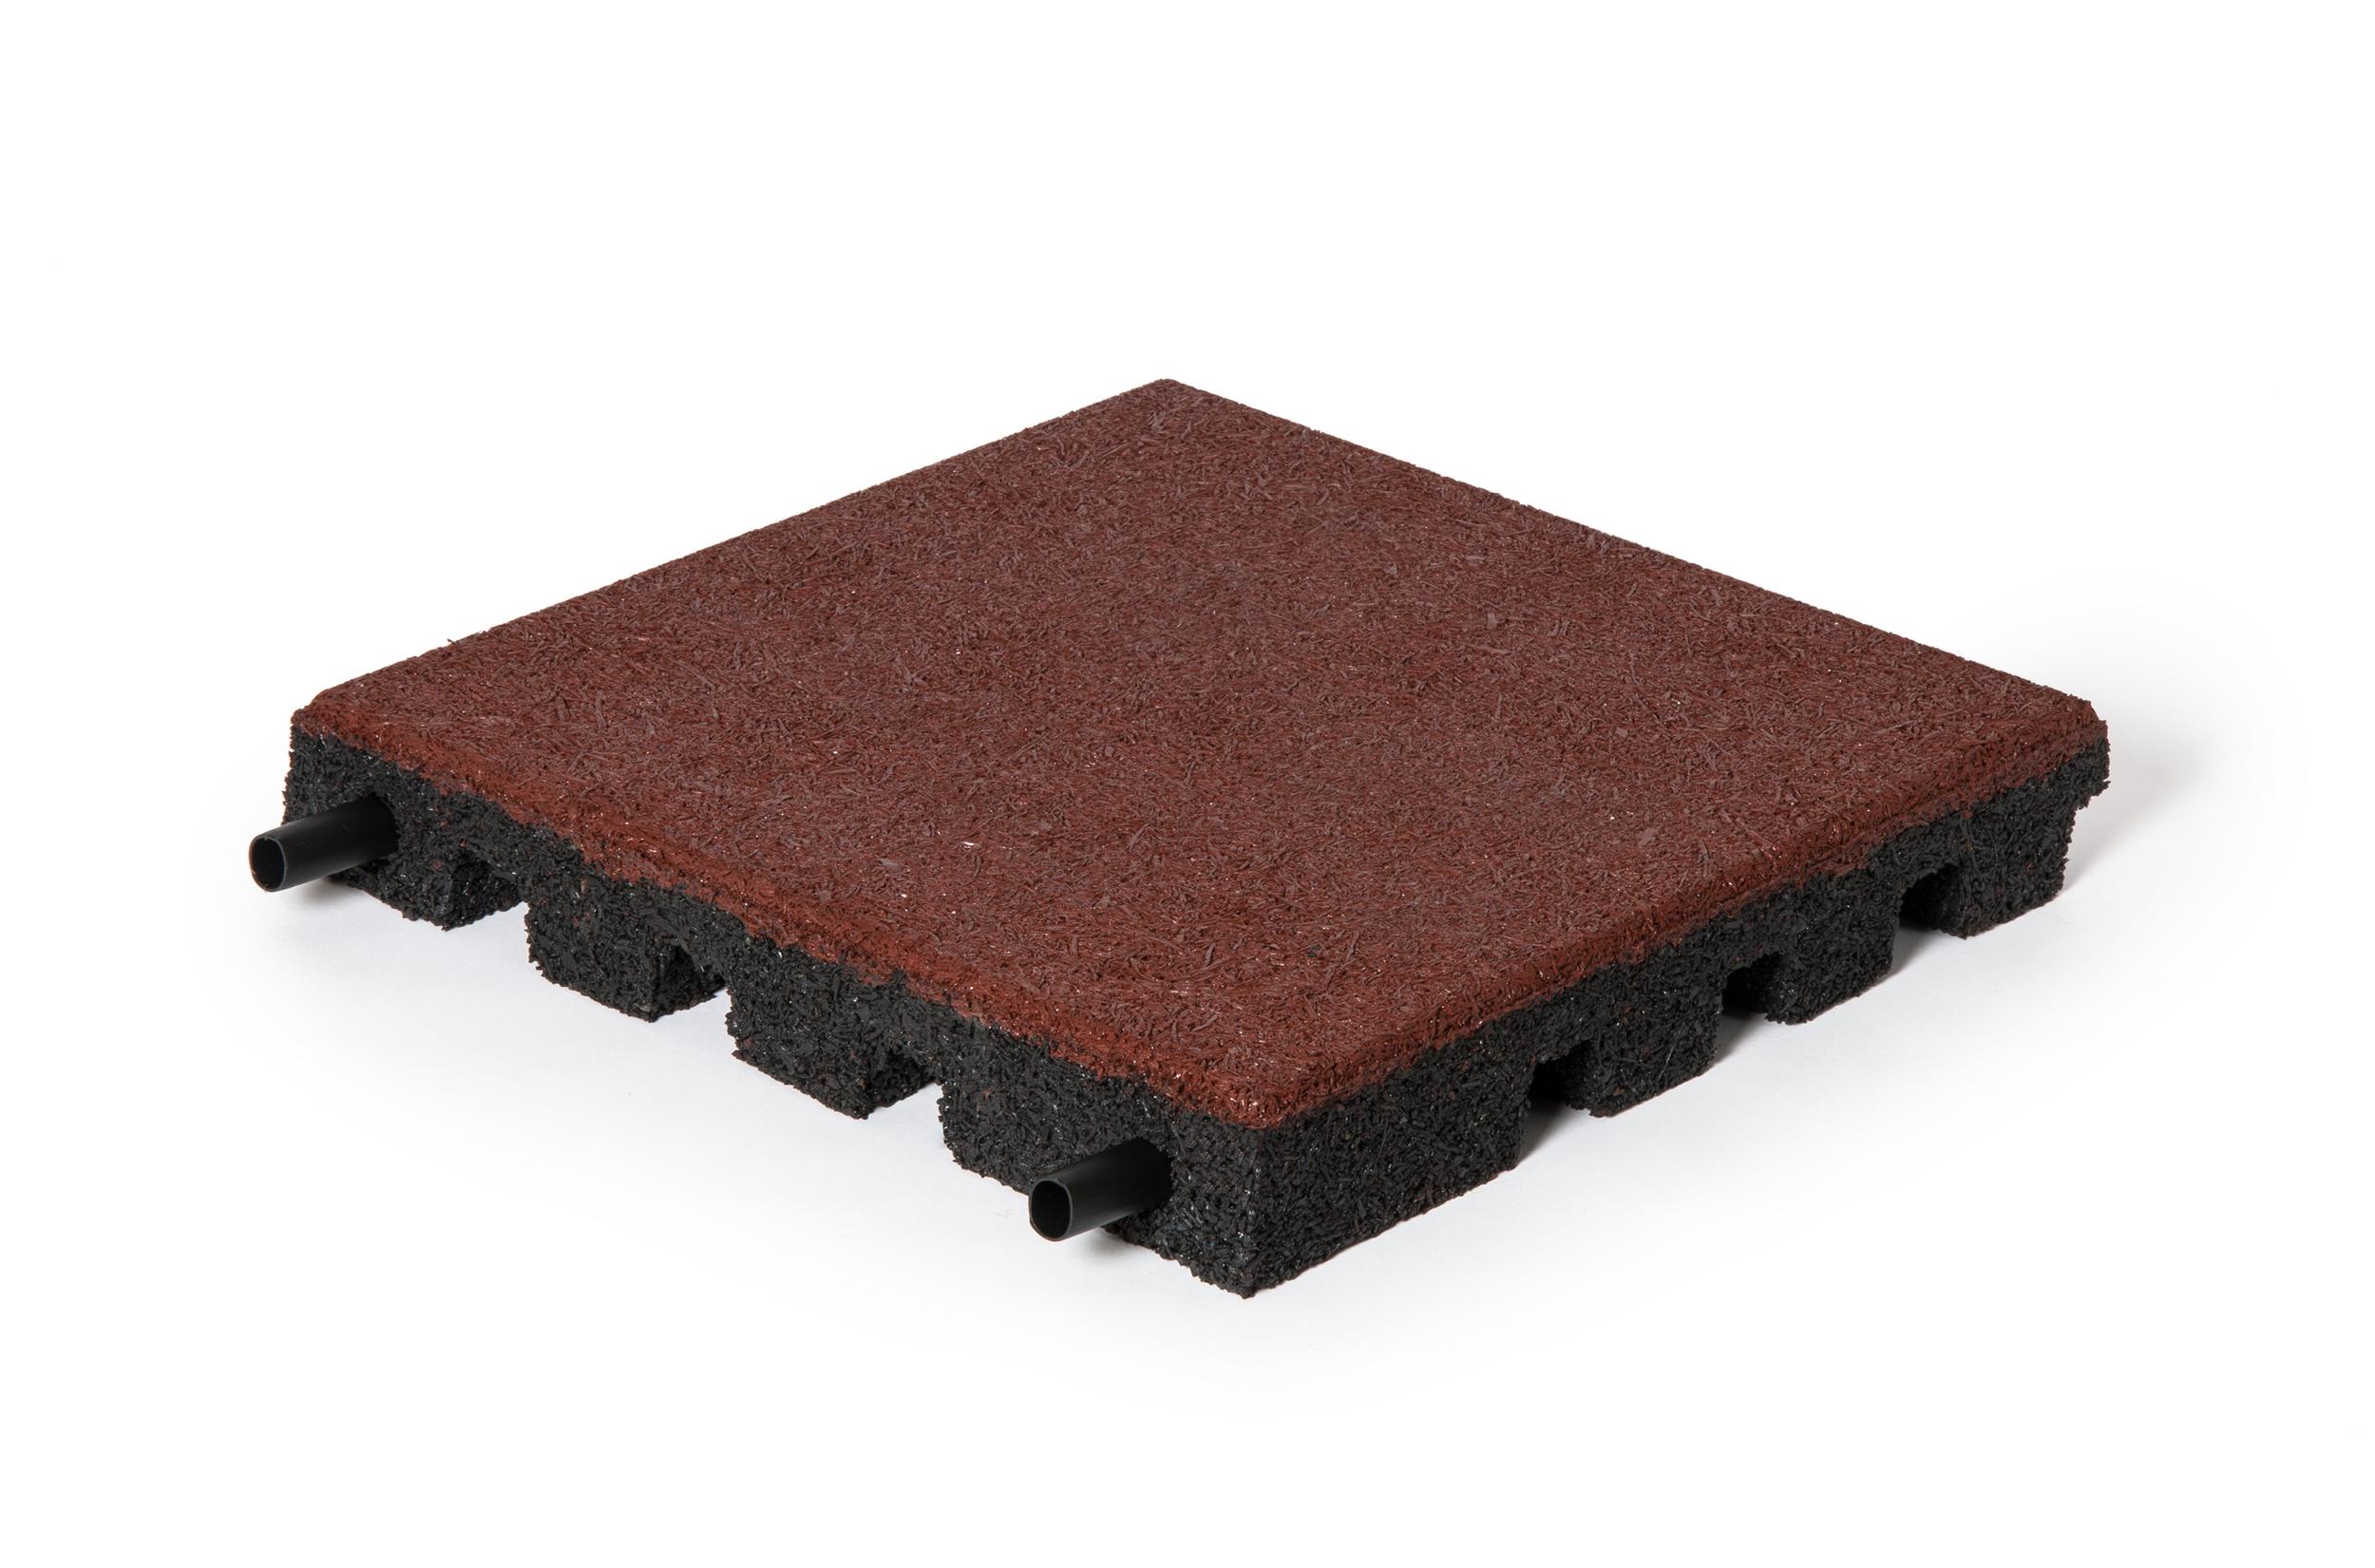 Rymar-Rubber-PlayFall-Tiles-Red-2.jpg